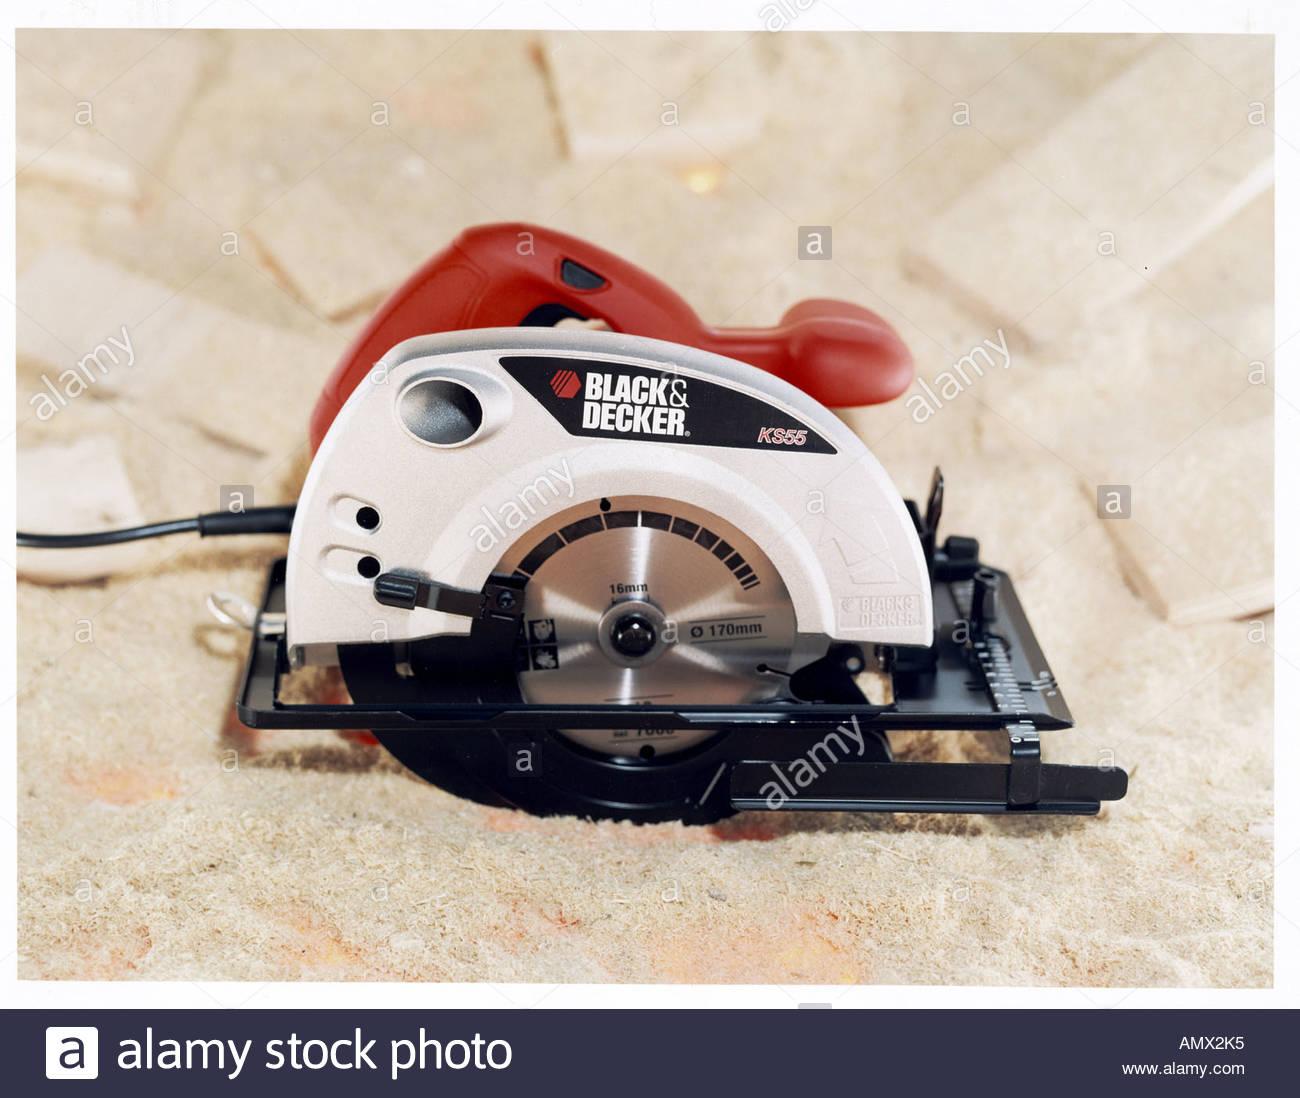 Black Decker Electric Saw